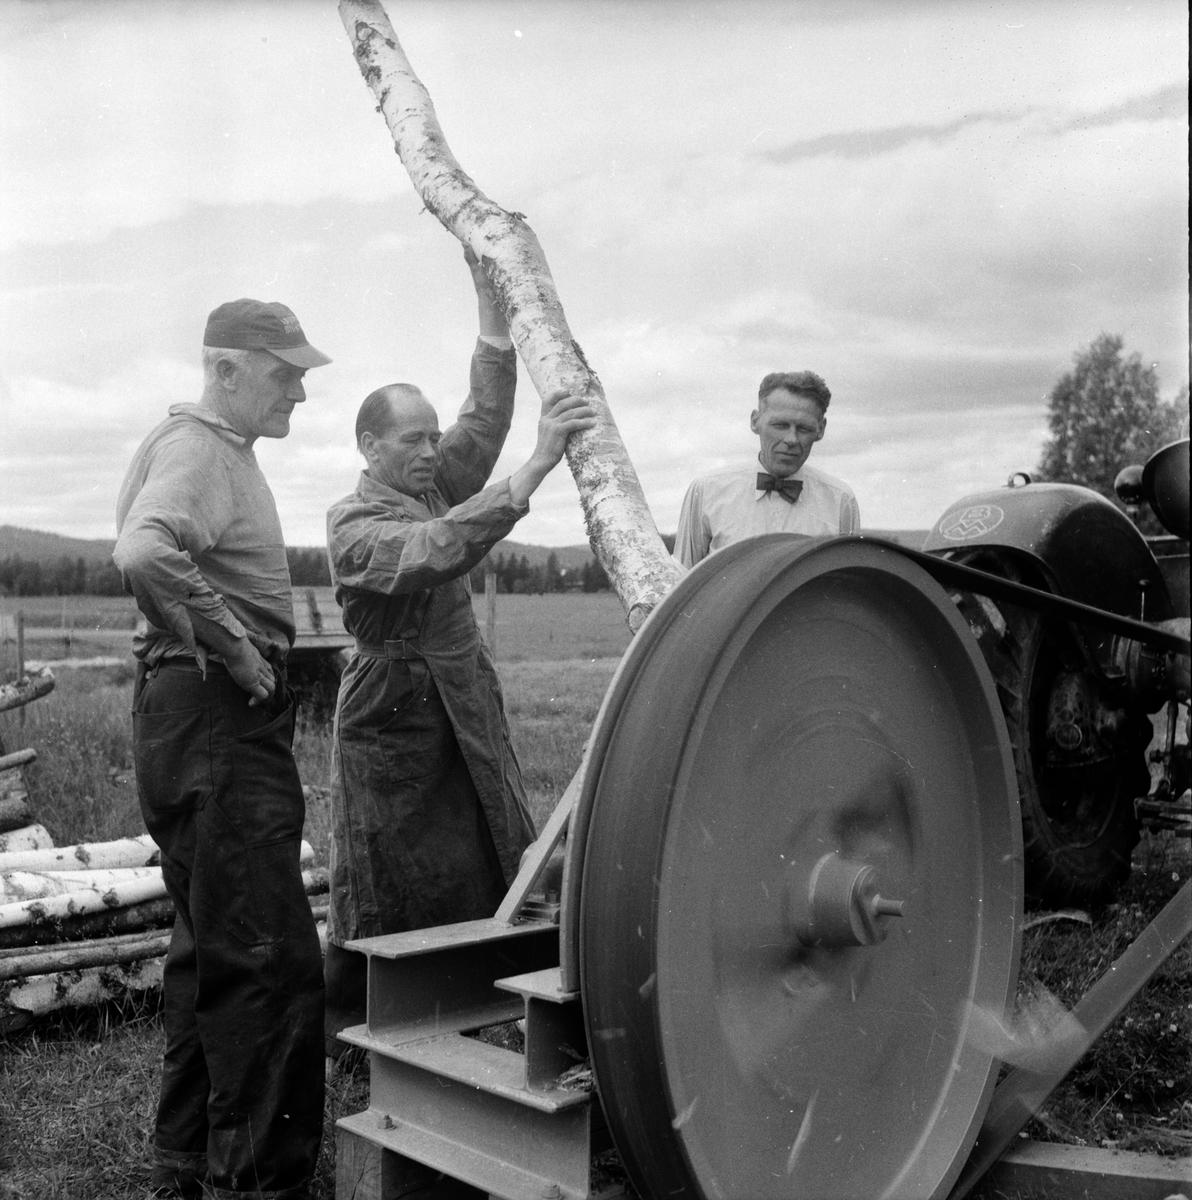 """Hälsingetuggen"" demonstreras. Landafors 16/7 1958"